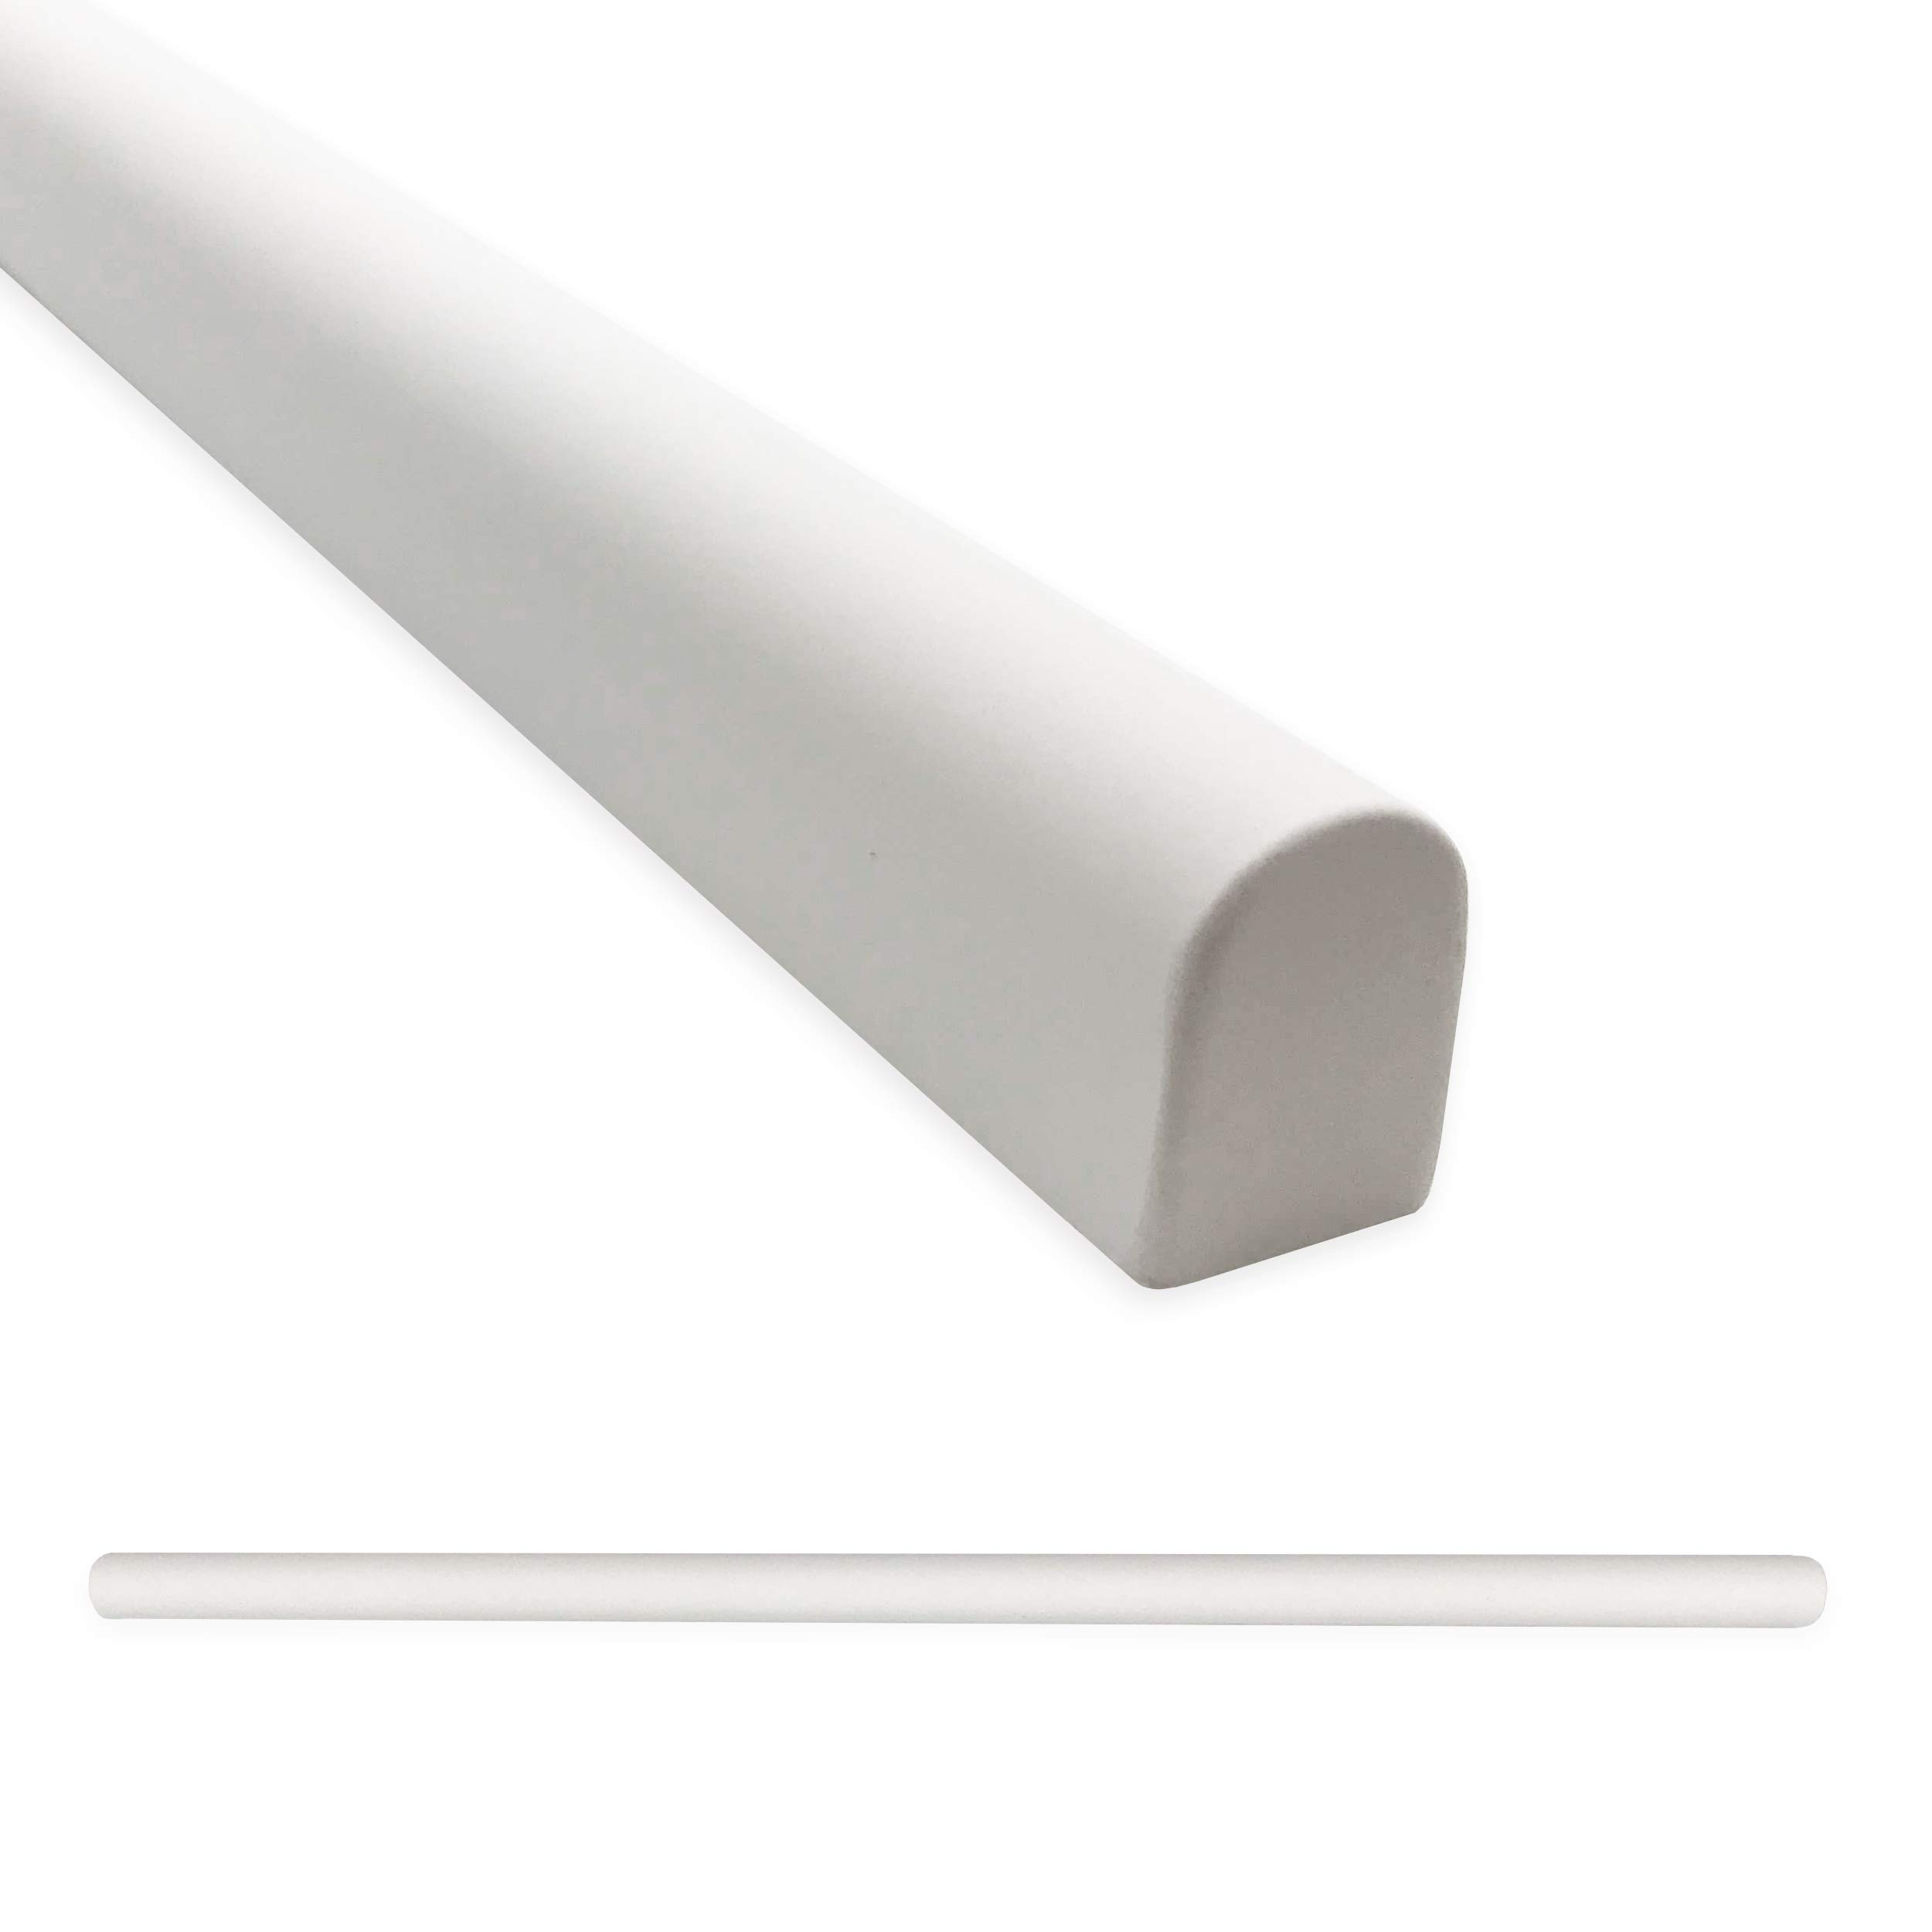 Tile Trim 1/2 X 12 inch Soho Pencil Shower Ceramic Tile Transition Liner Backsplash Wall Molding - Matte Bright White (6 Pack)